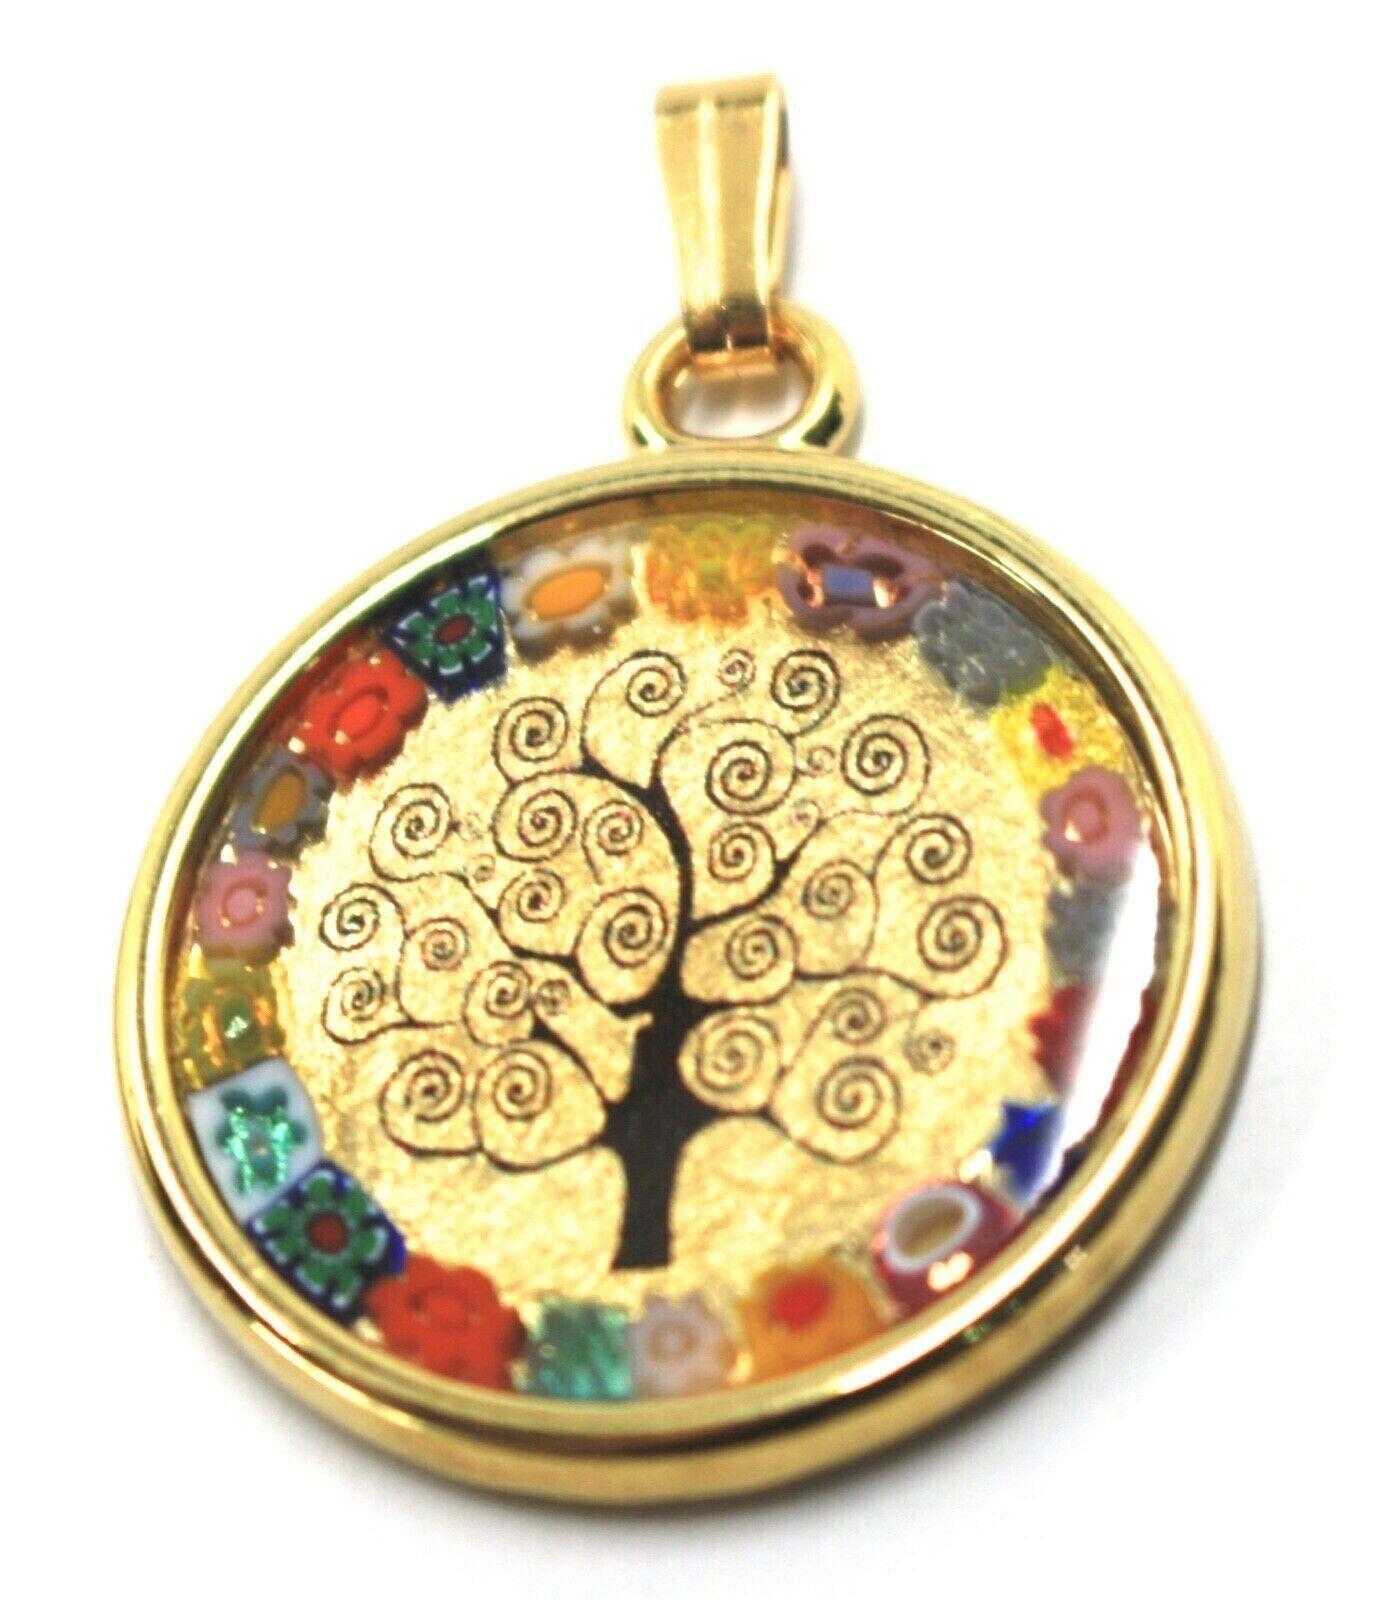 "MURANO GLASS ROUND MEDAL PENDANT TREE OF LIFE, 25mm 1"", FLOWER FRAME, GOLD LEAF"